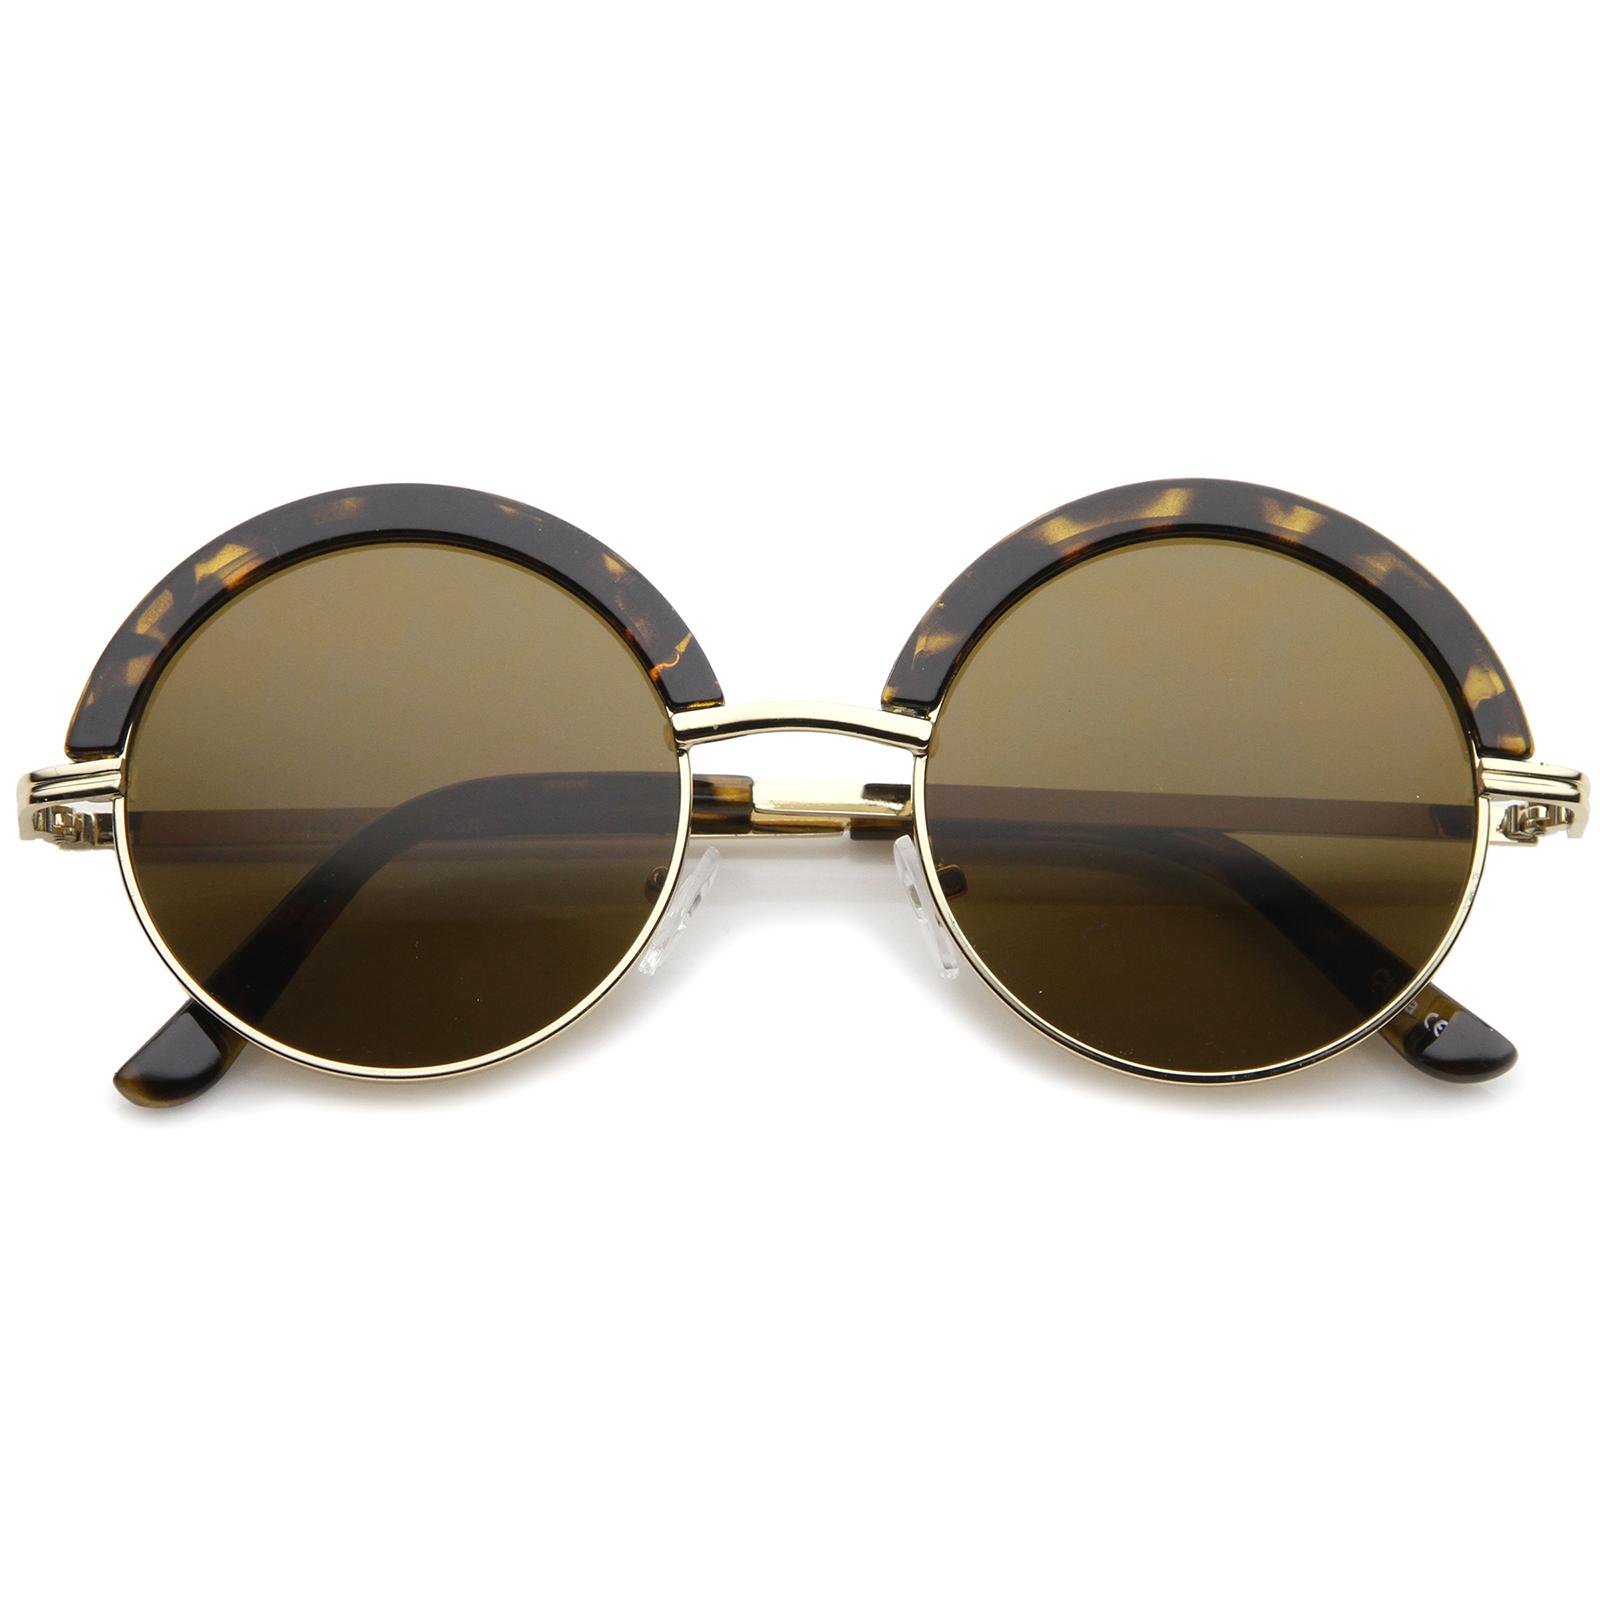 Half Frame Round Eyeglasses : sunglassLA Mod Fashion Oversize Half-Frame Brow Eyelid ...